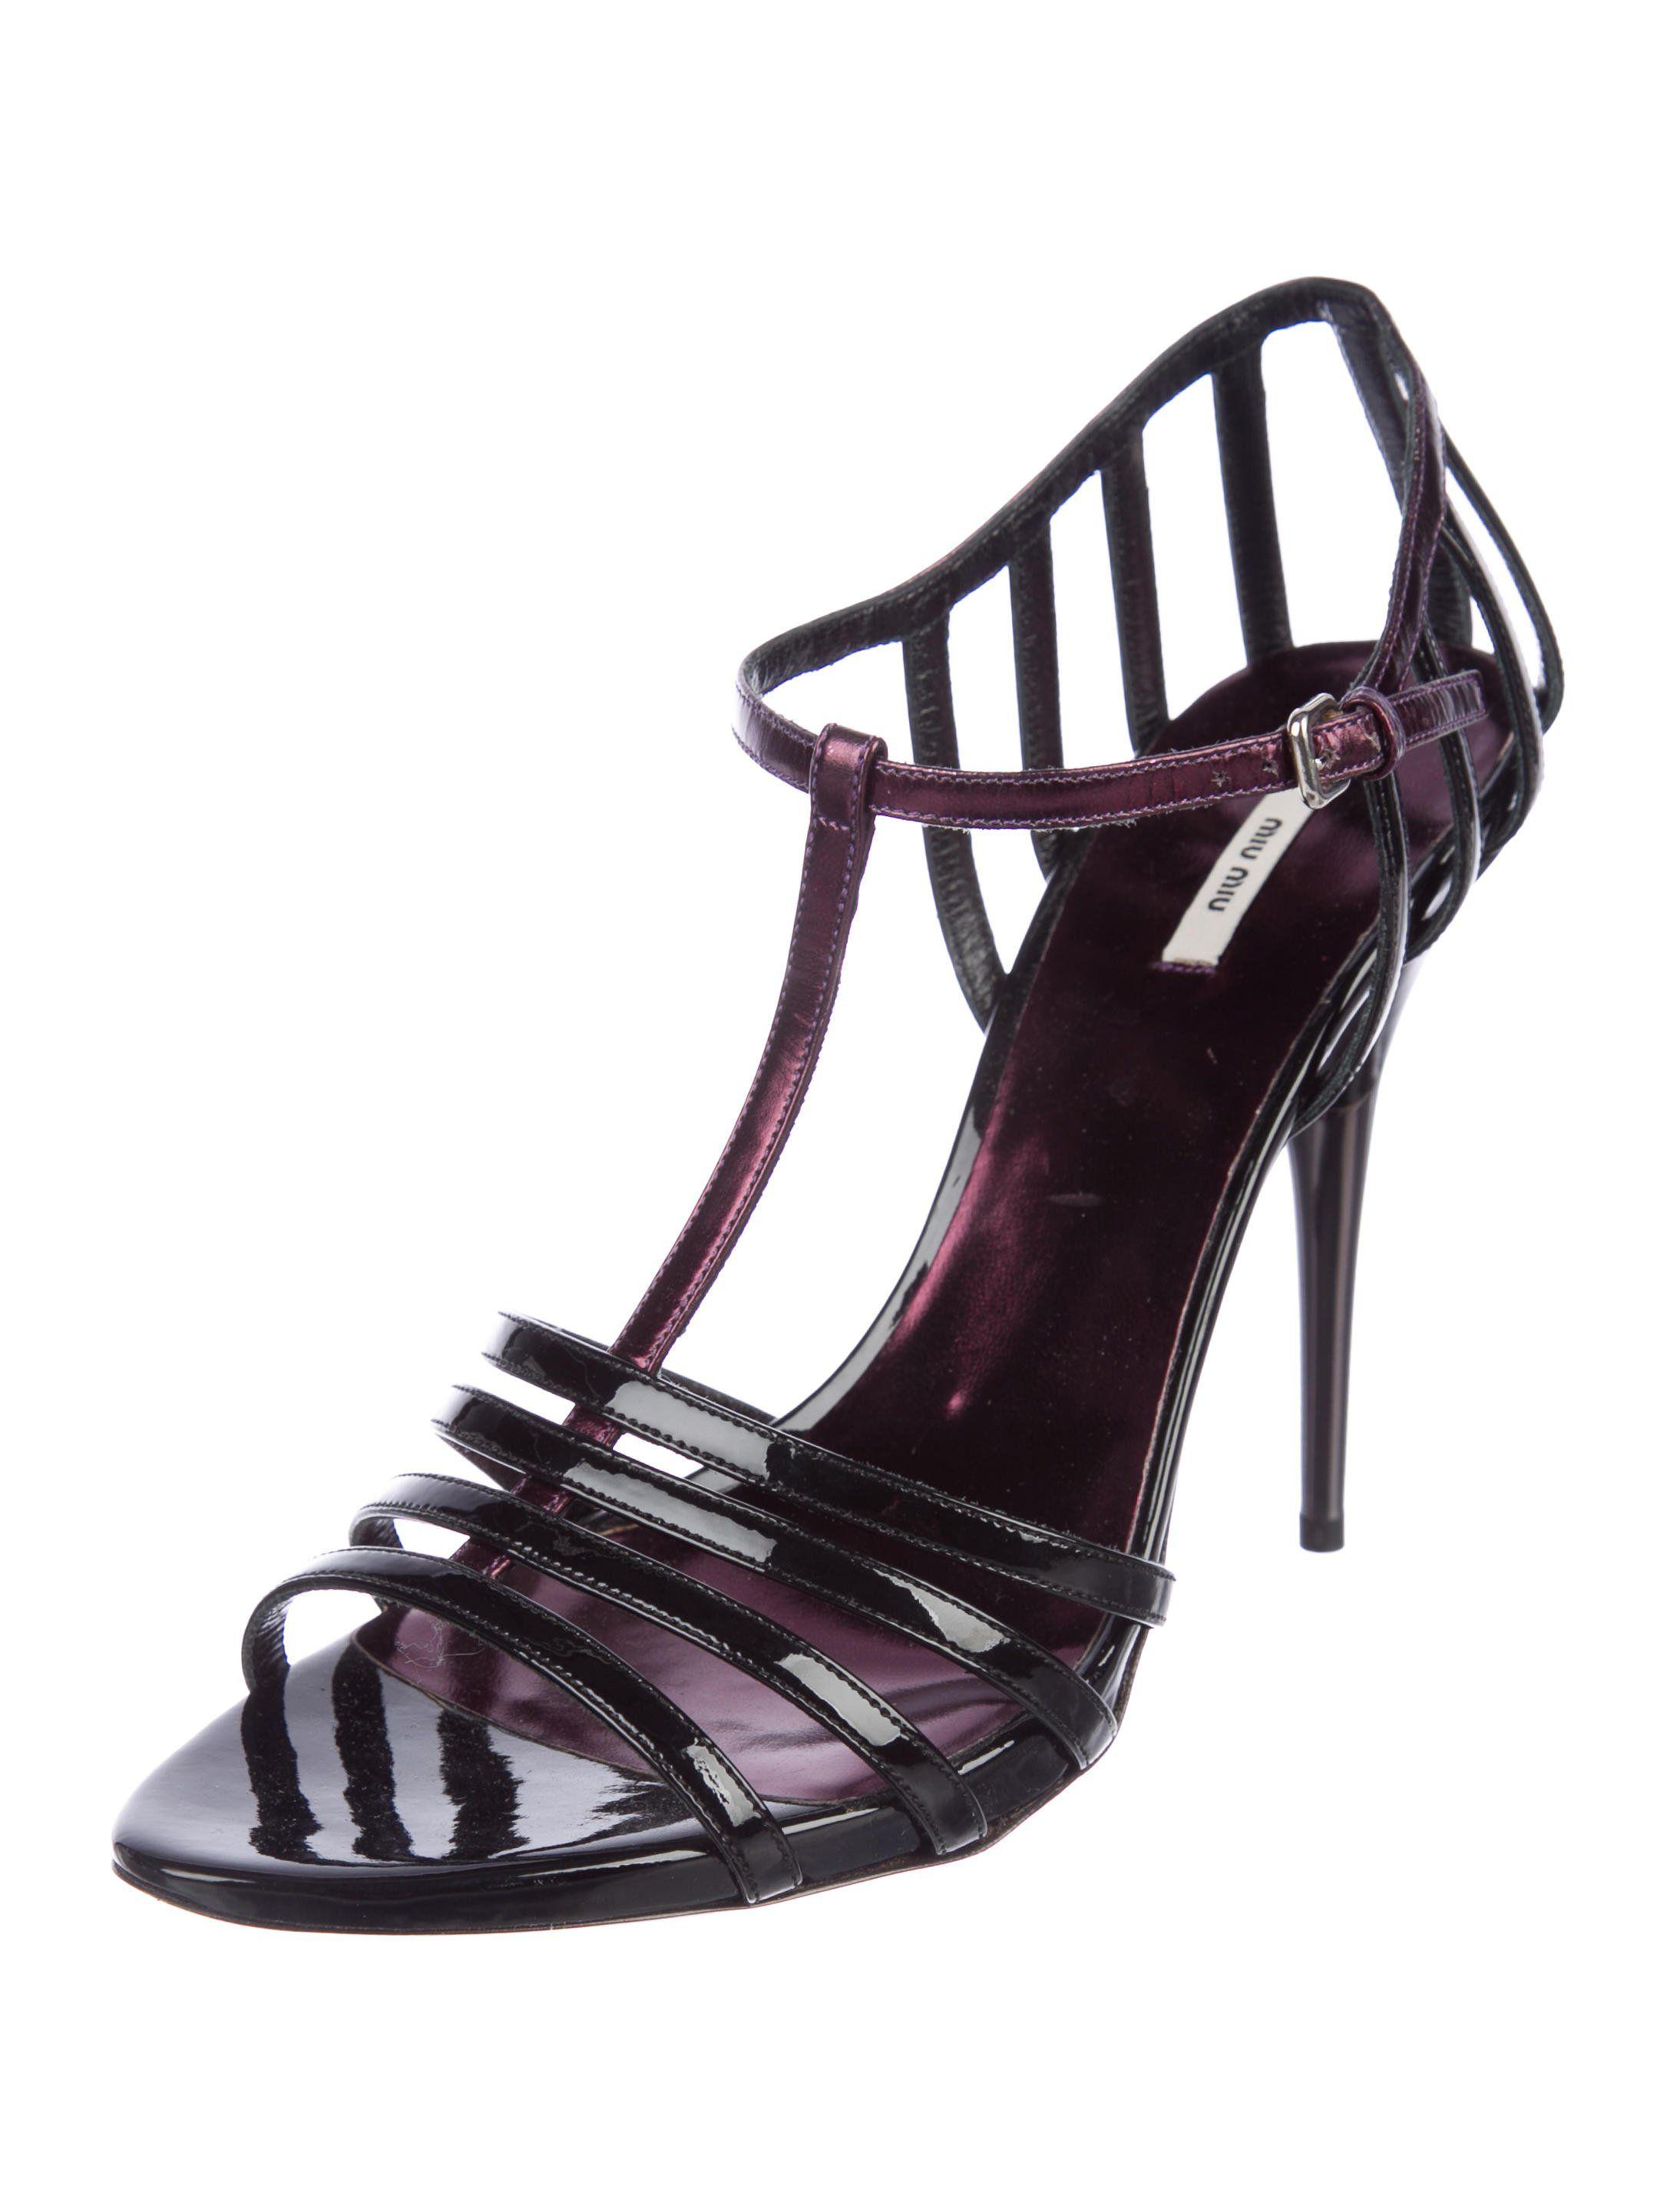 55bec71cc5ac Black and plum patent leather Miu Miu T-strap sandals with tonal stitching